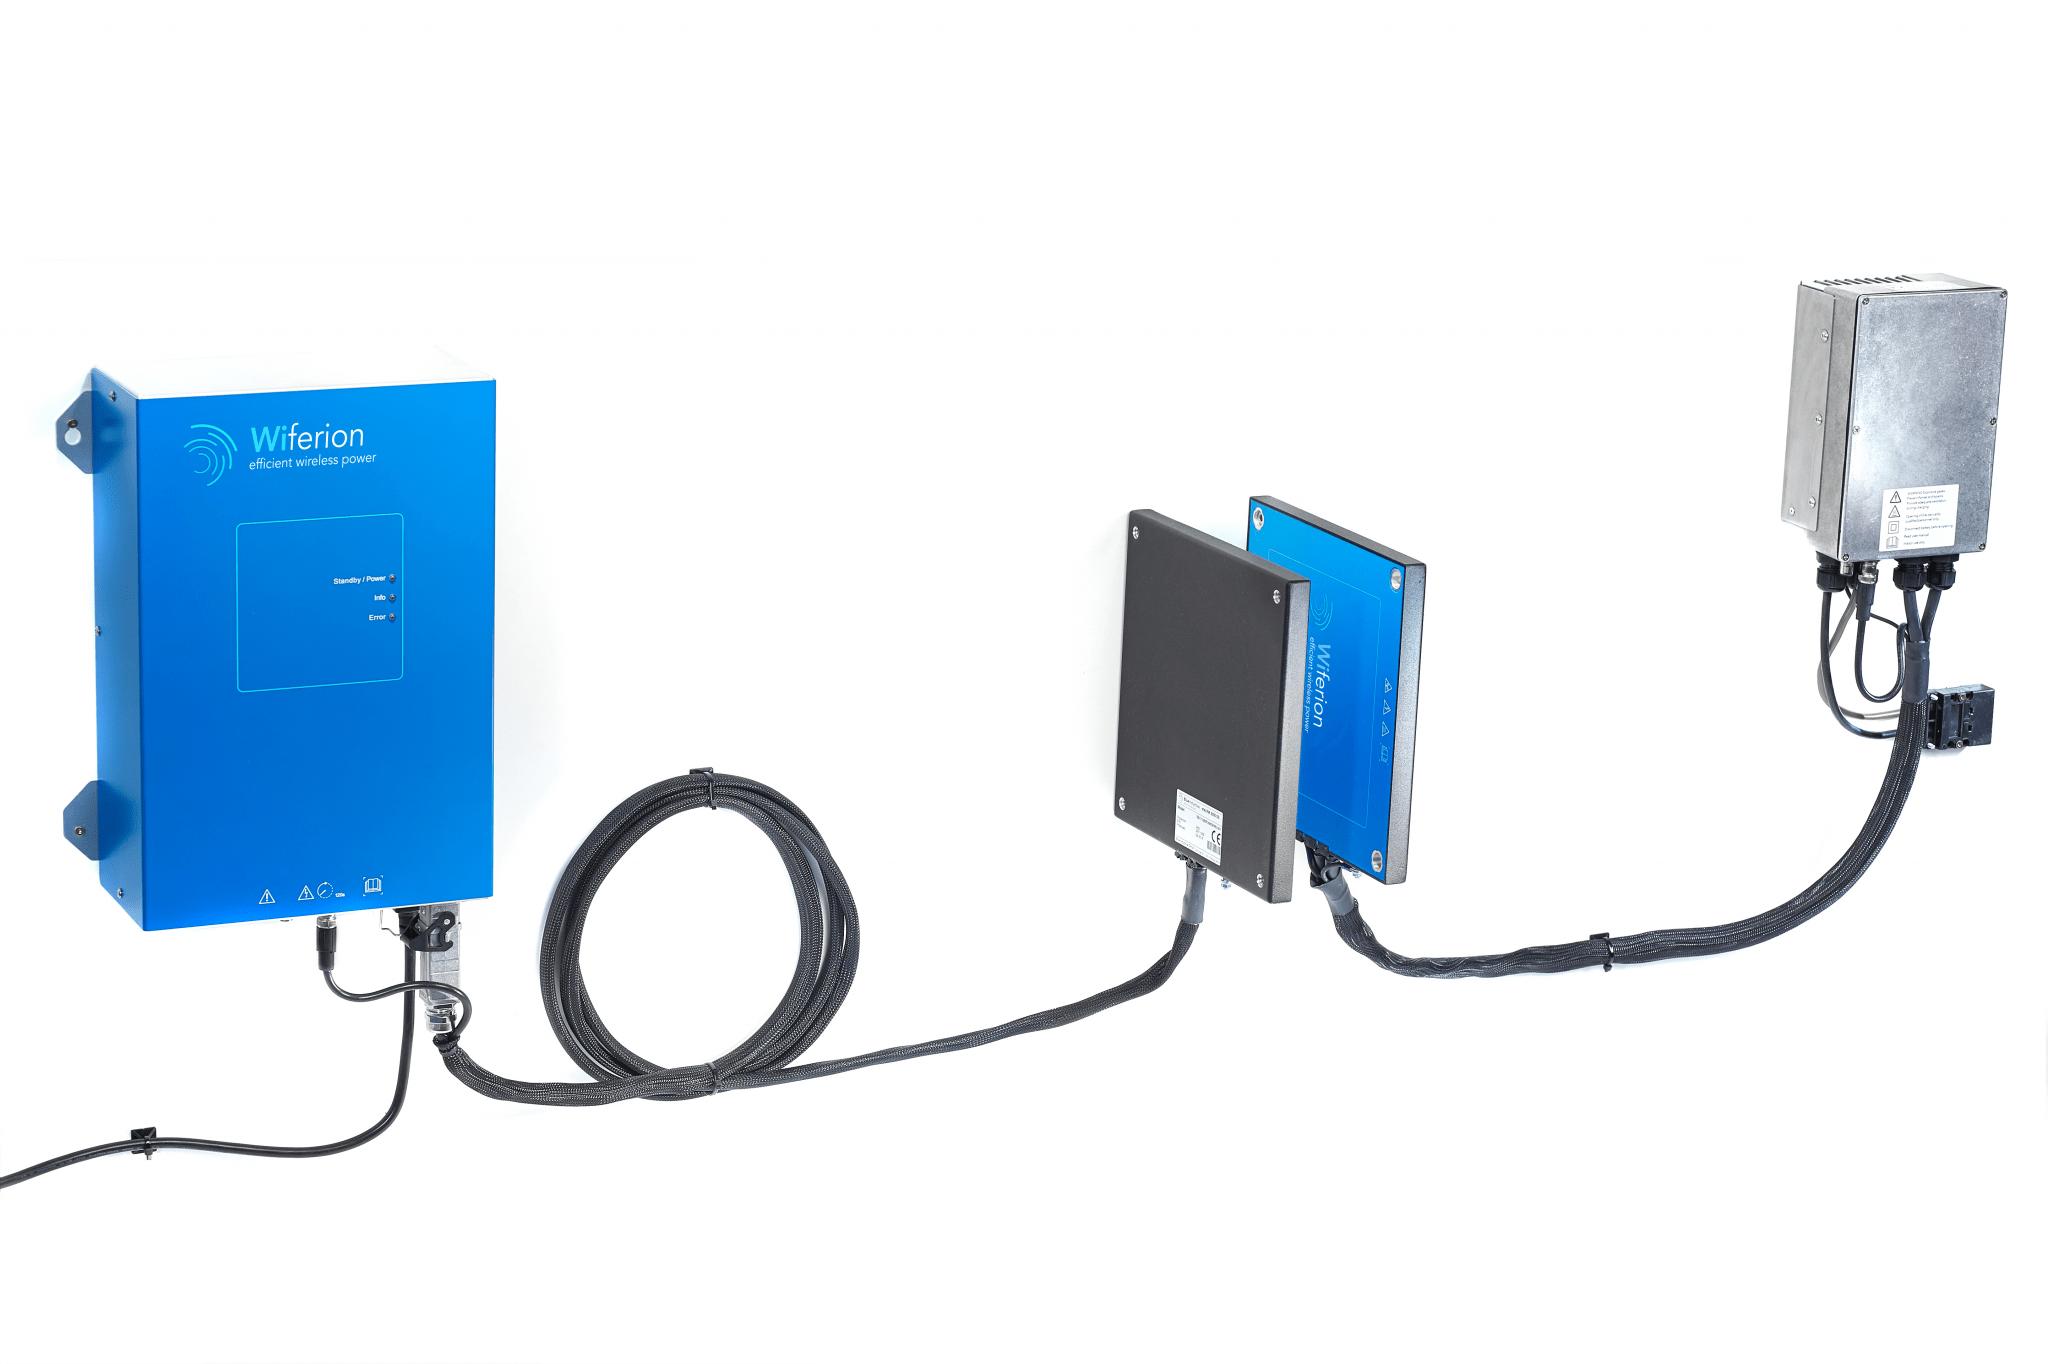 Wiferion efficient wireless charging - Product - etaLink 3000 - induktives laden